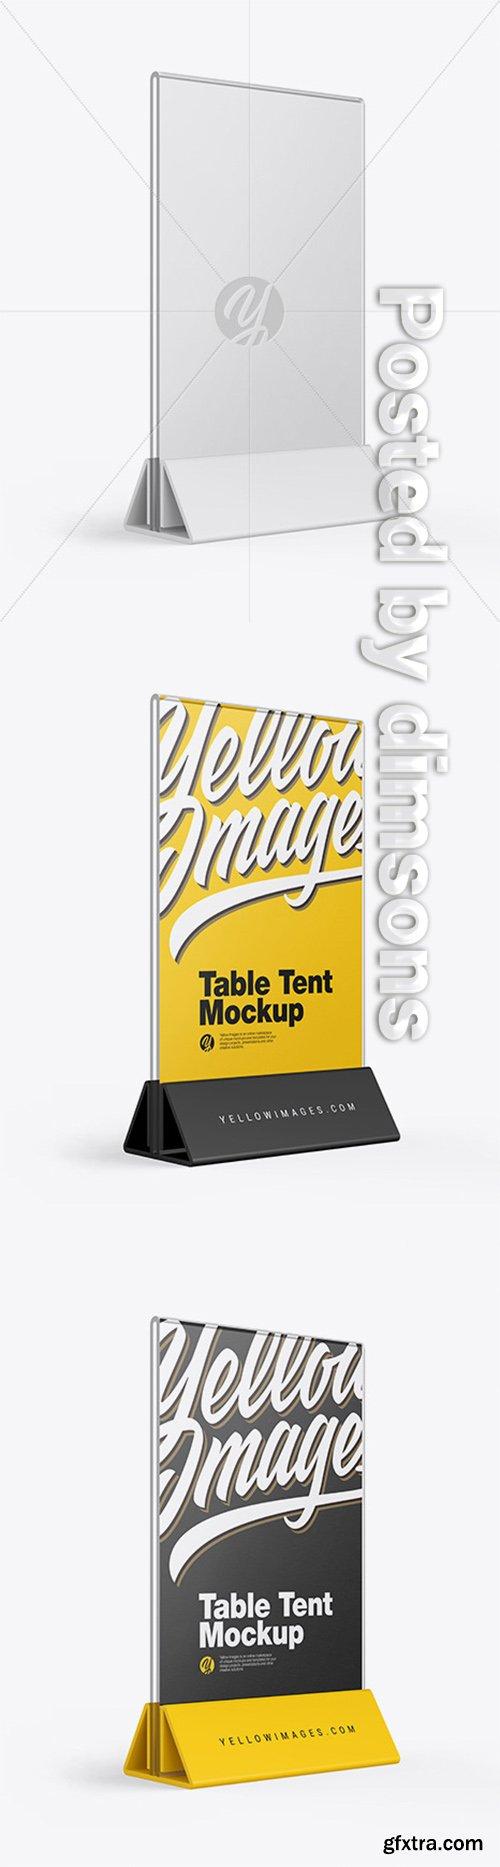 Glass Table Tent Mockup 49205